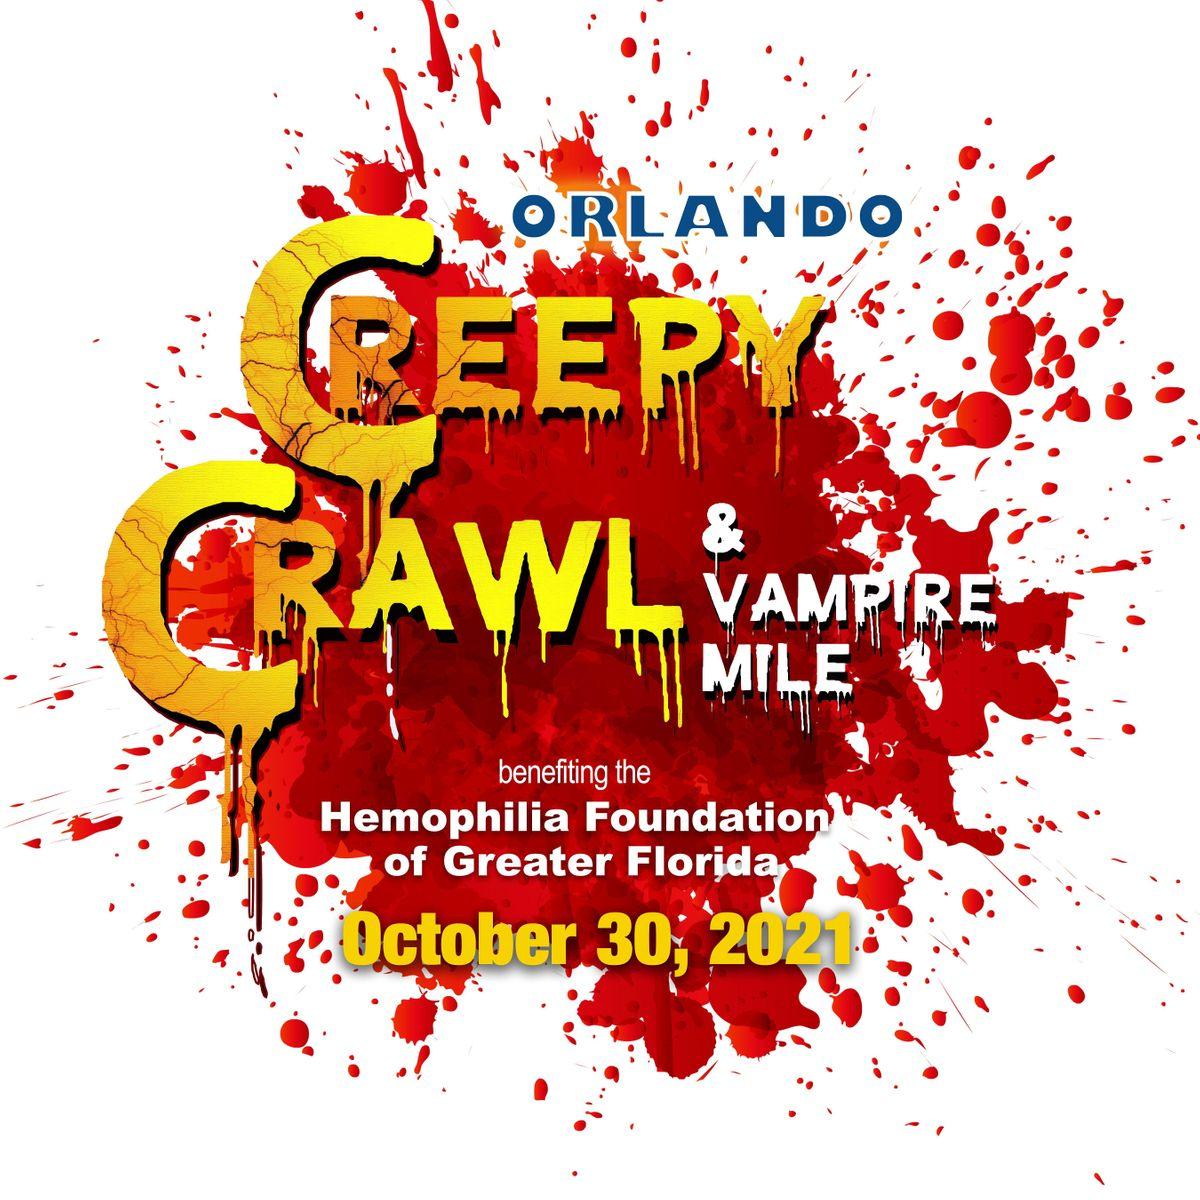 Orlando Creepy Crawl